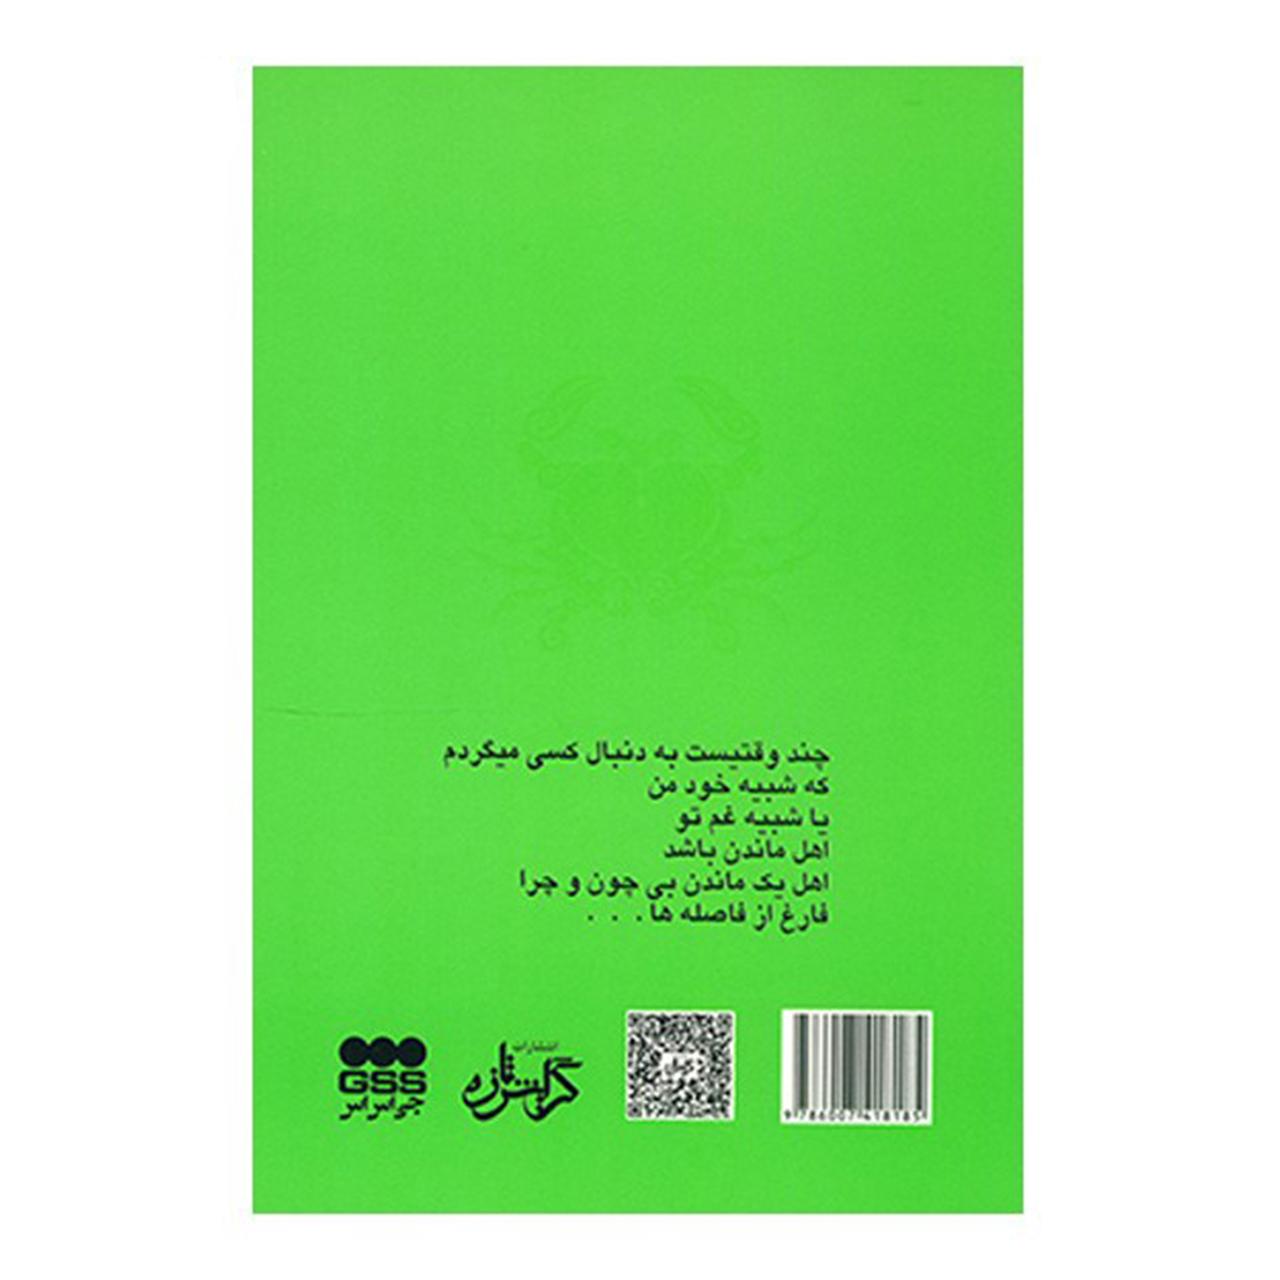 کتاب مجموعه اشعار سرطان عشق اثر ناصر پروانی